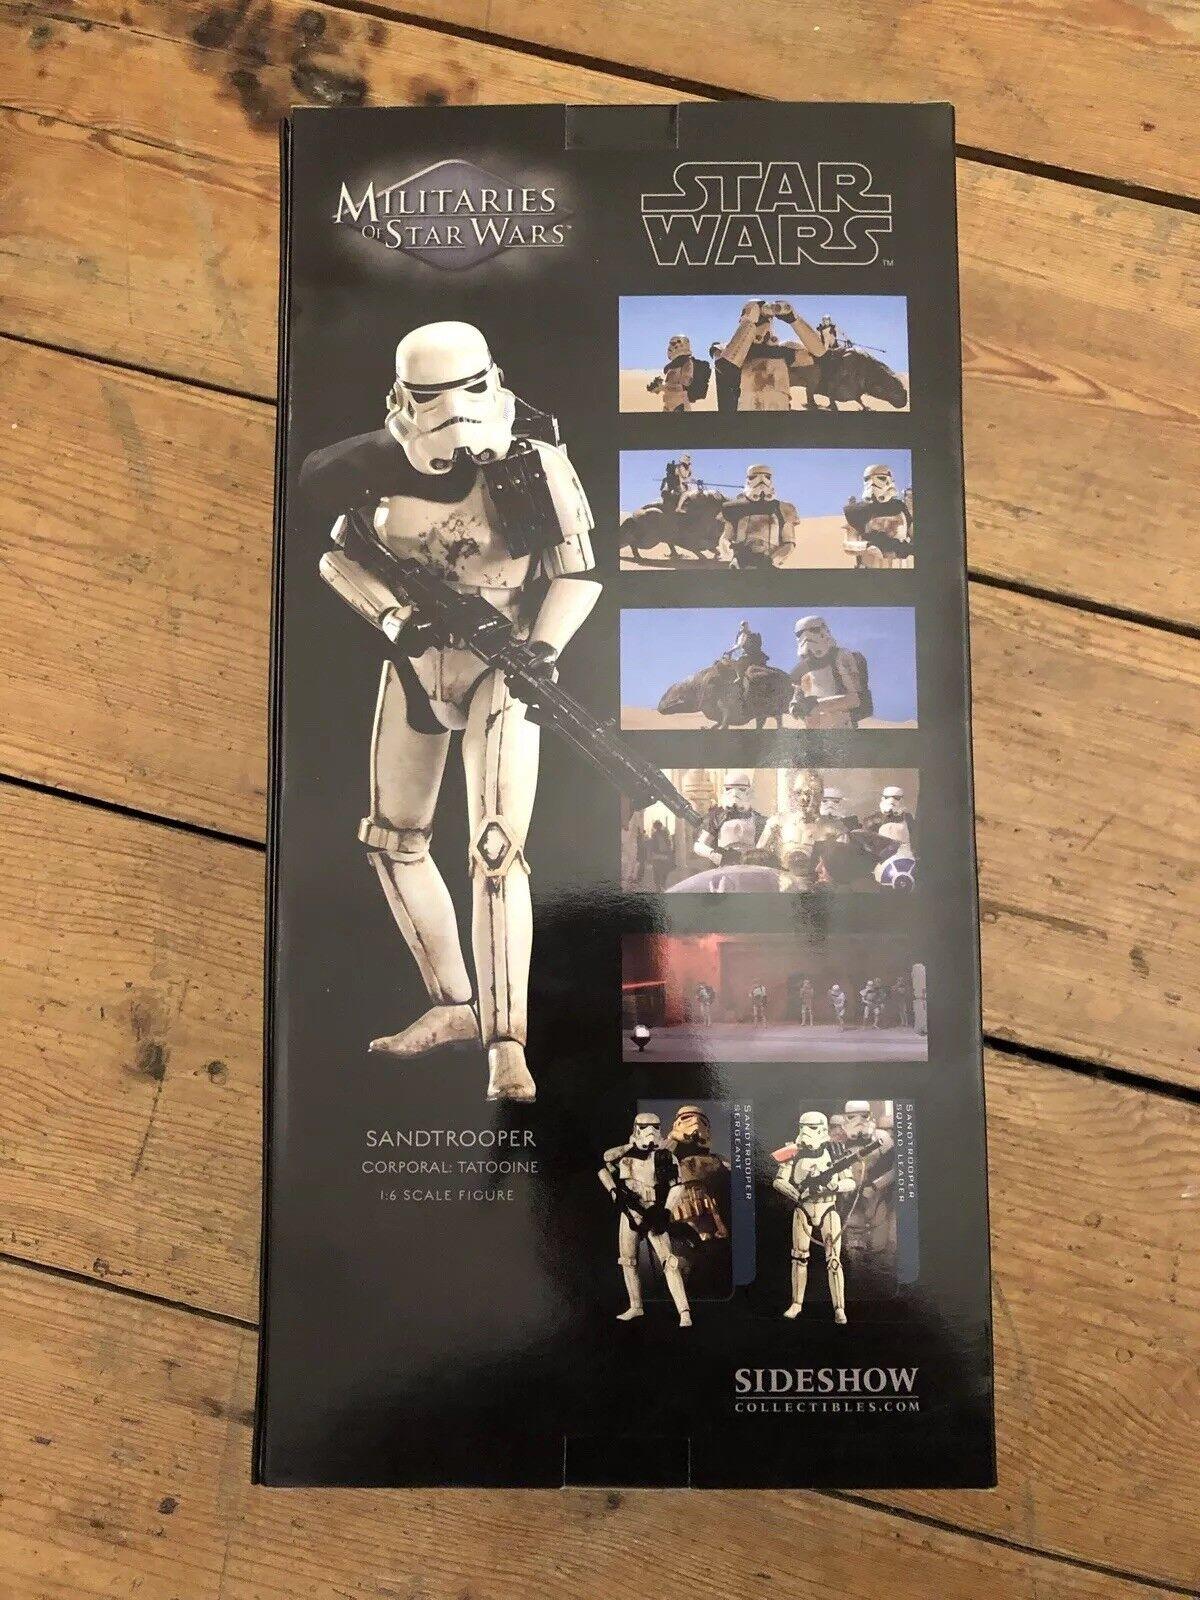 Sidemostrare ARMA DI estrella guerras Setrooper esclusivo CAPORALE  TATOOINE TATOOINE TATOOINE SSC1108 ee4c77